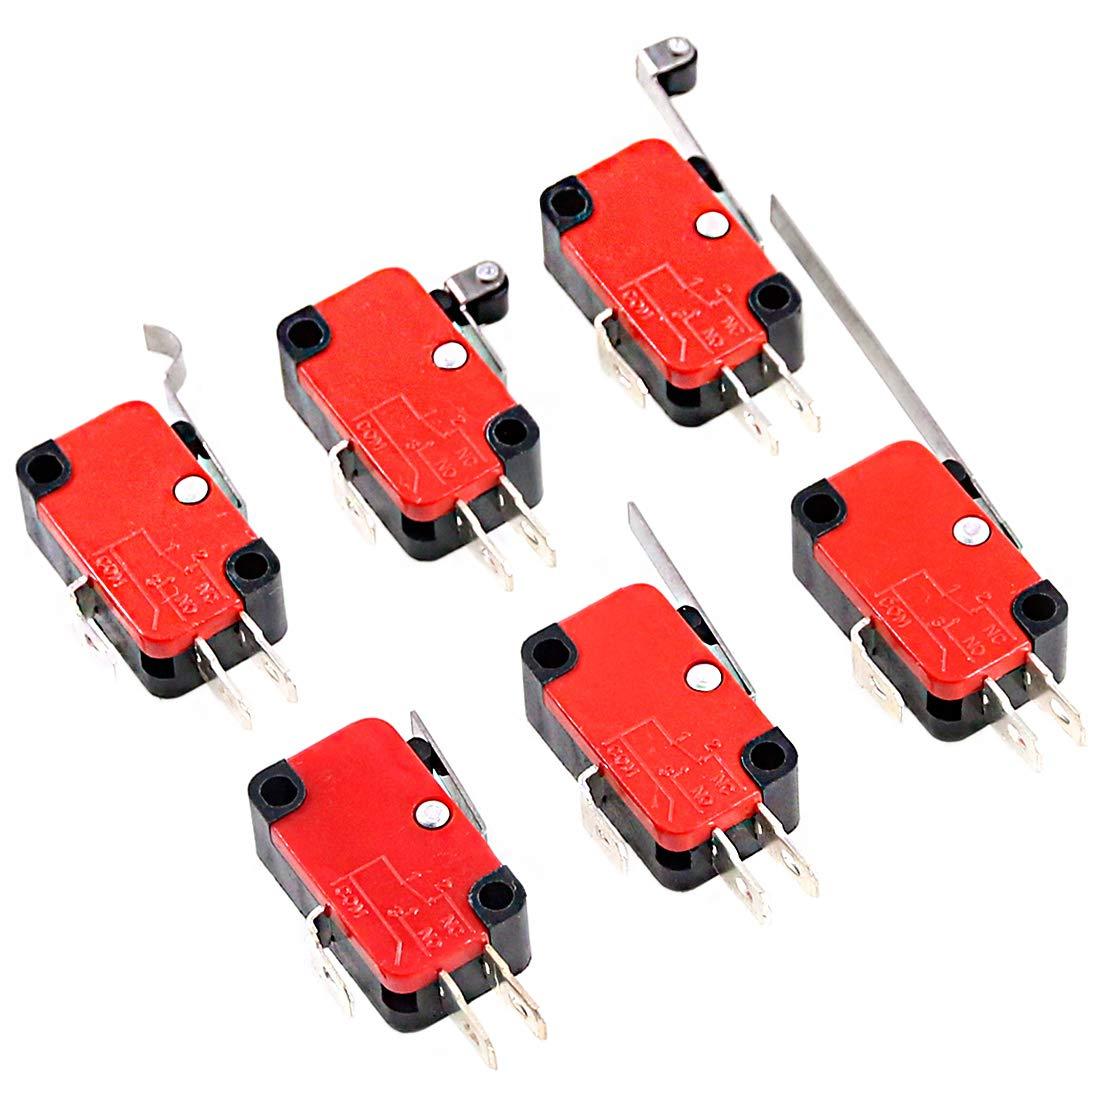 Swpeet 10Pcs V-151-1C25 Micro Selling Limit Long Mom Portland Mall Hinge Switch Roller